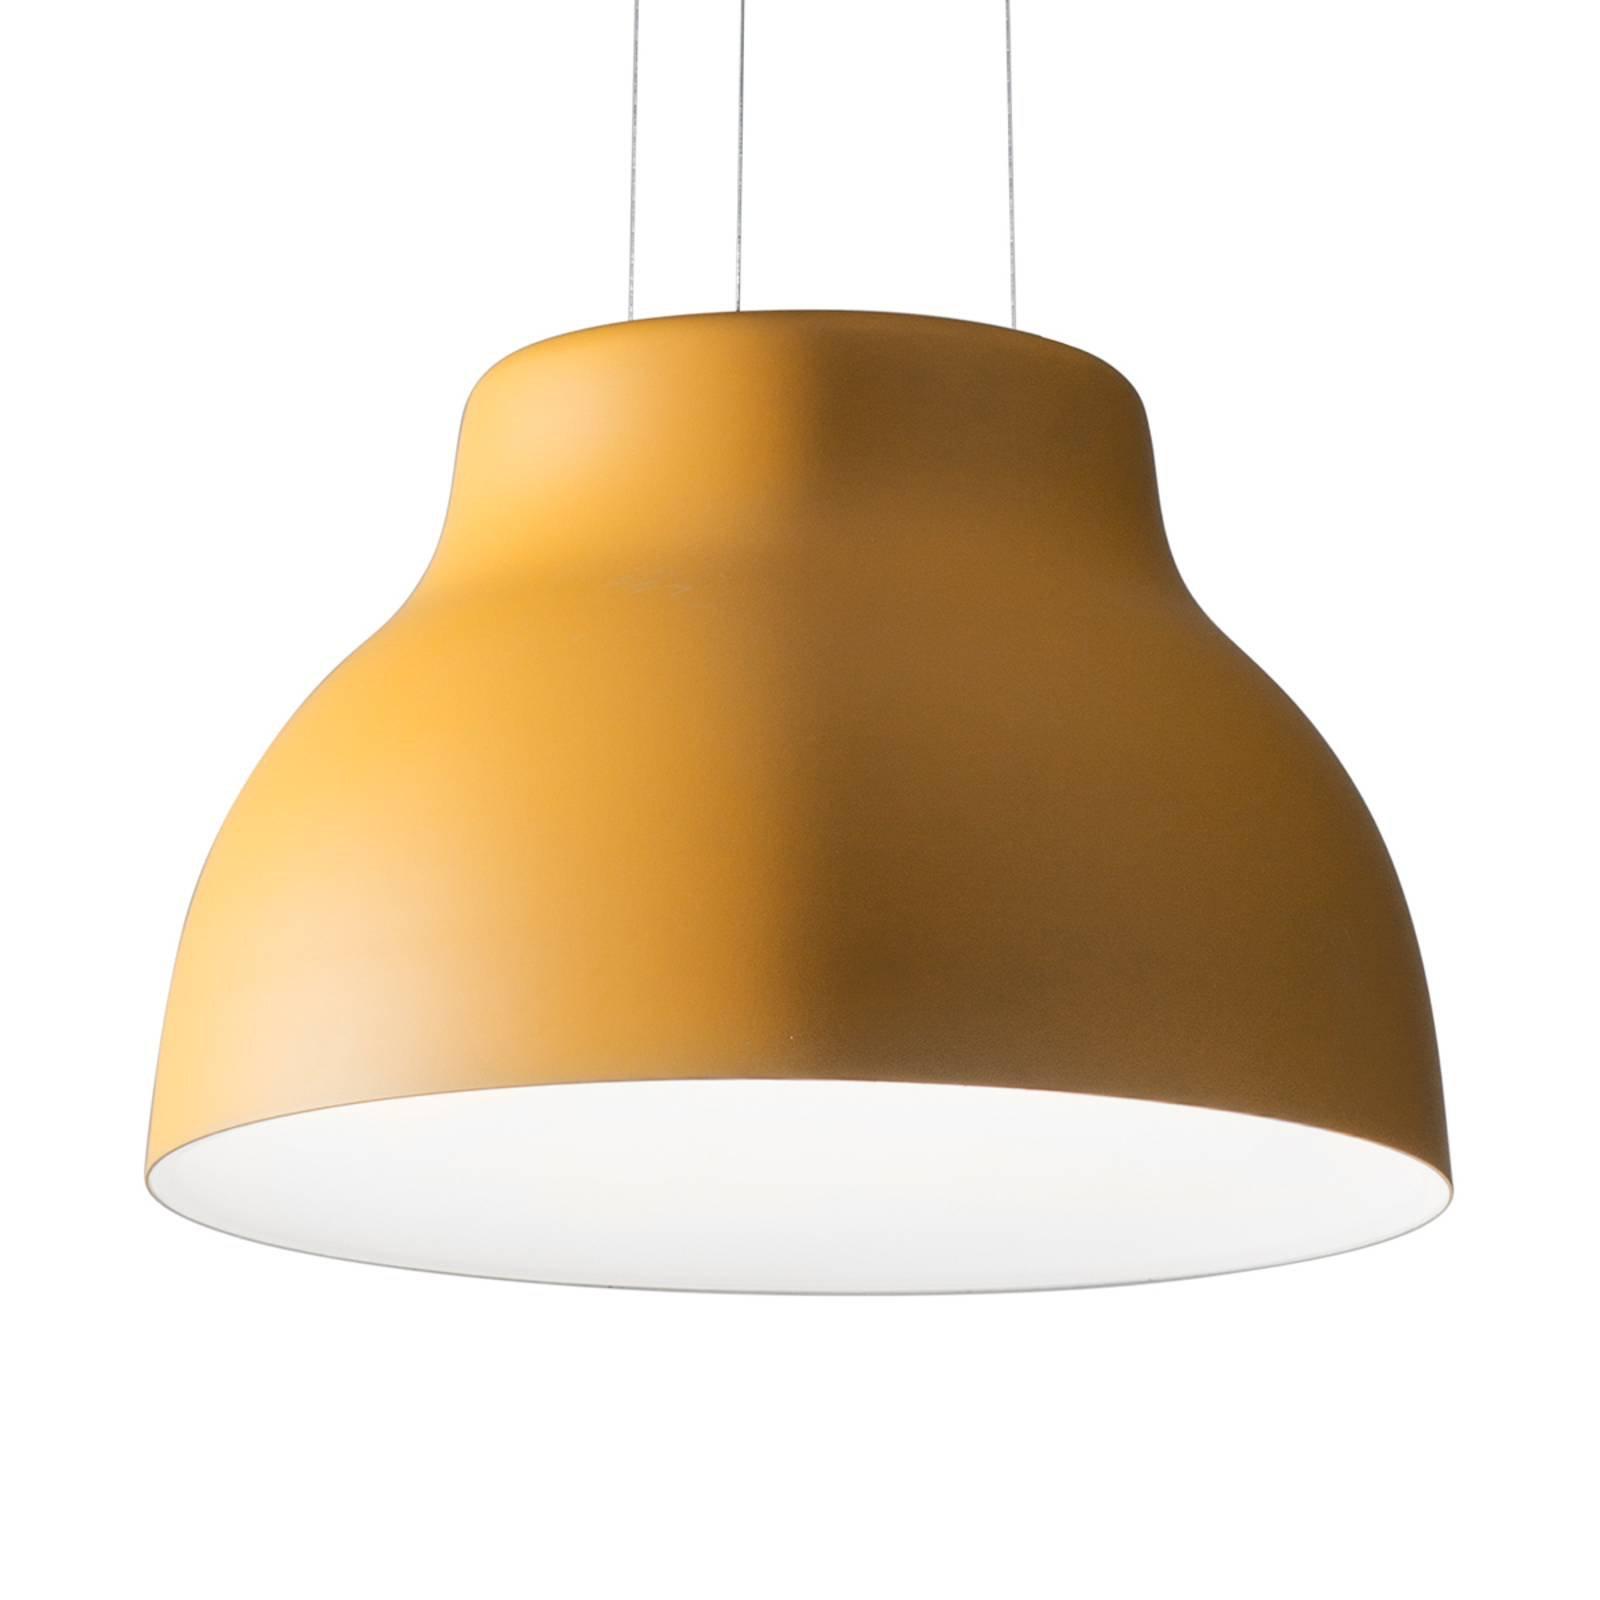 Martinelli Luce Cicala - LED-pendellampe, gul